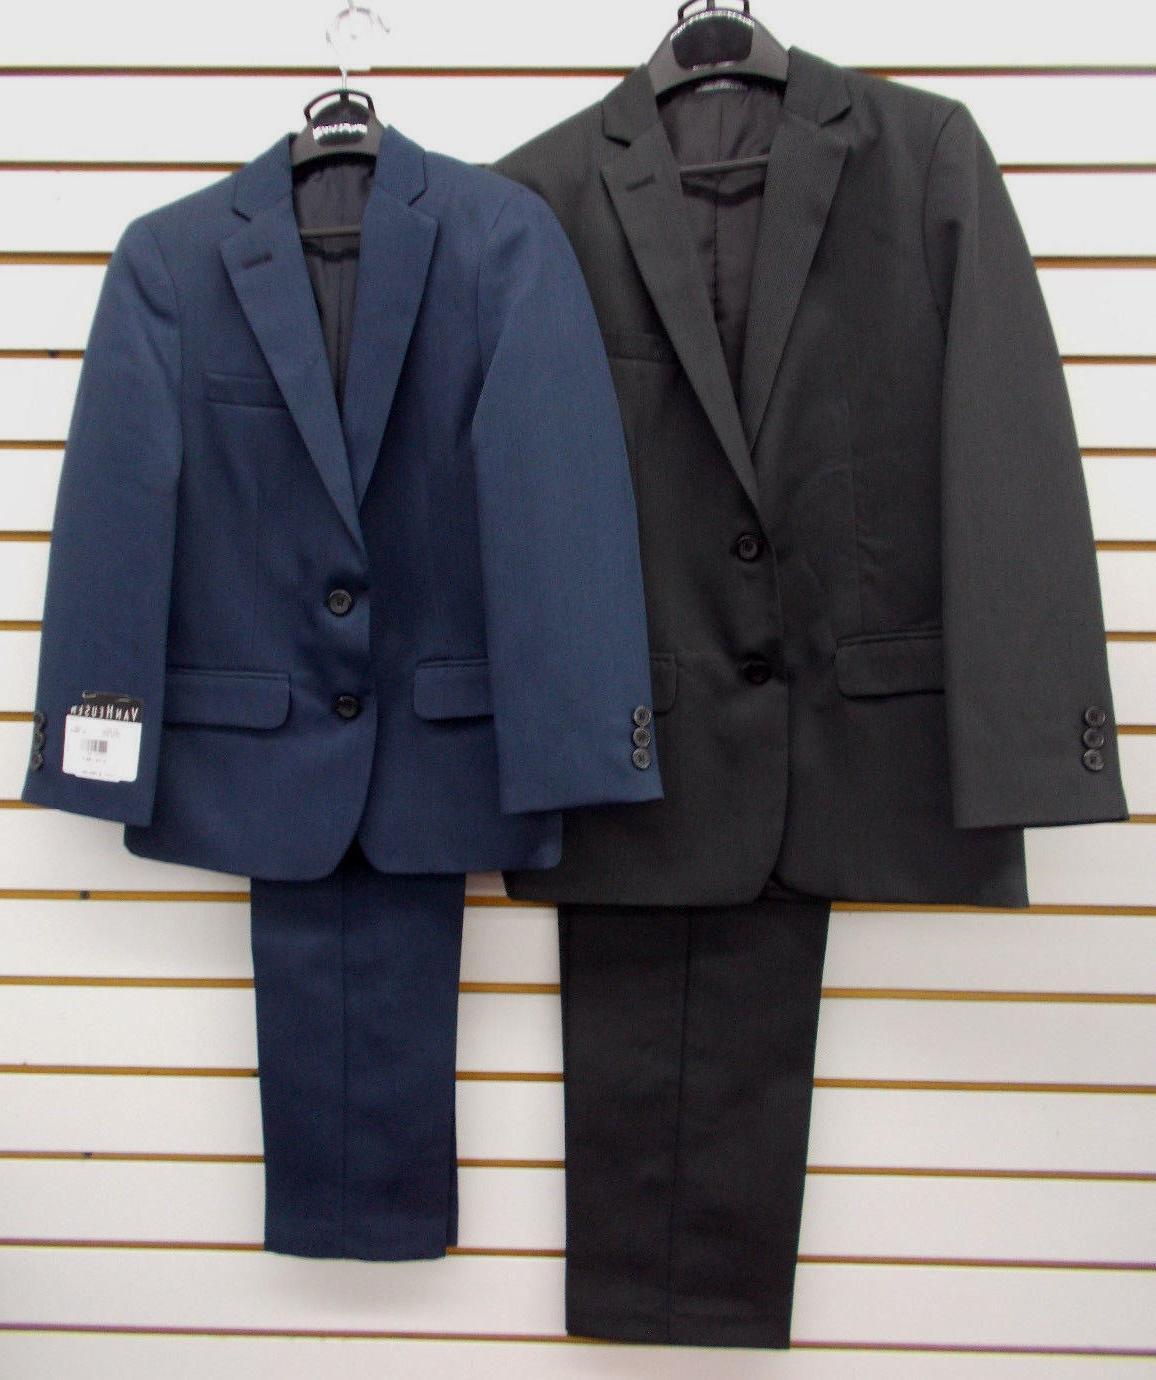 Boys Van Heusen $100 2pc Black or Dark Blue Suits Size 8 - 1